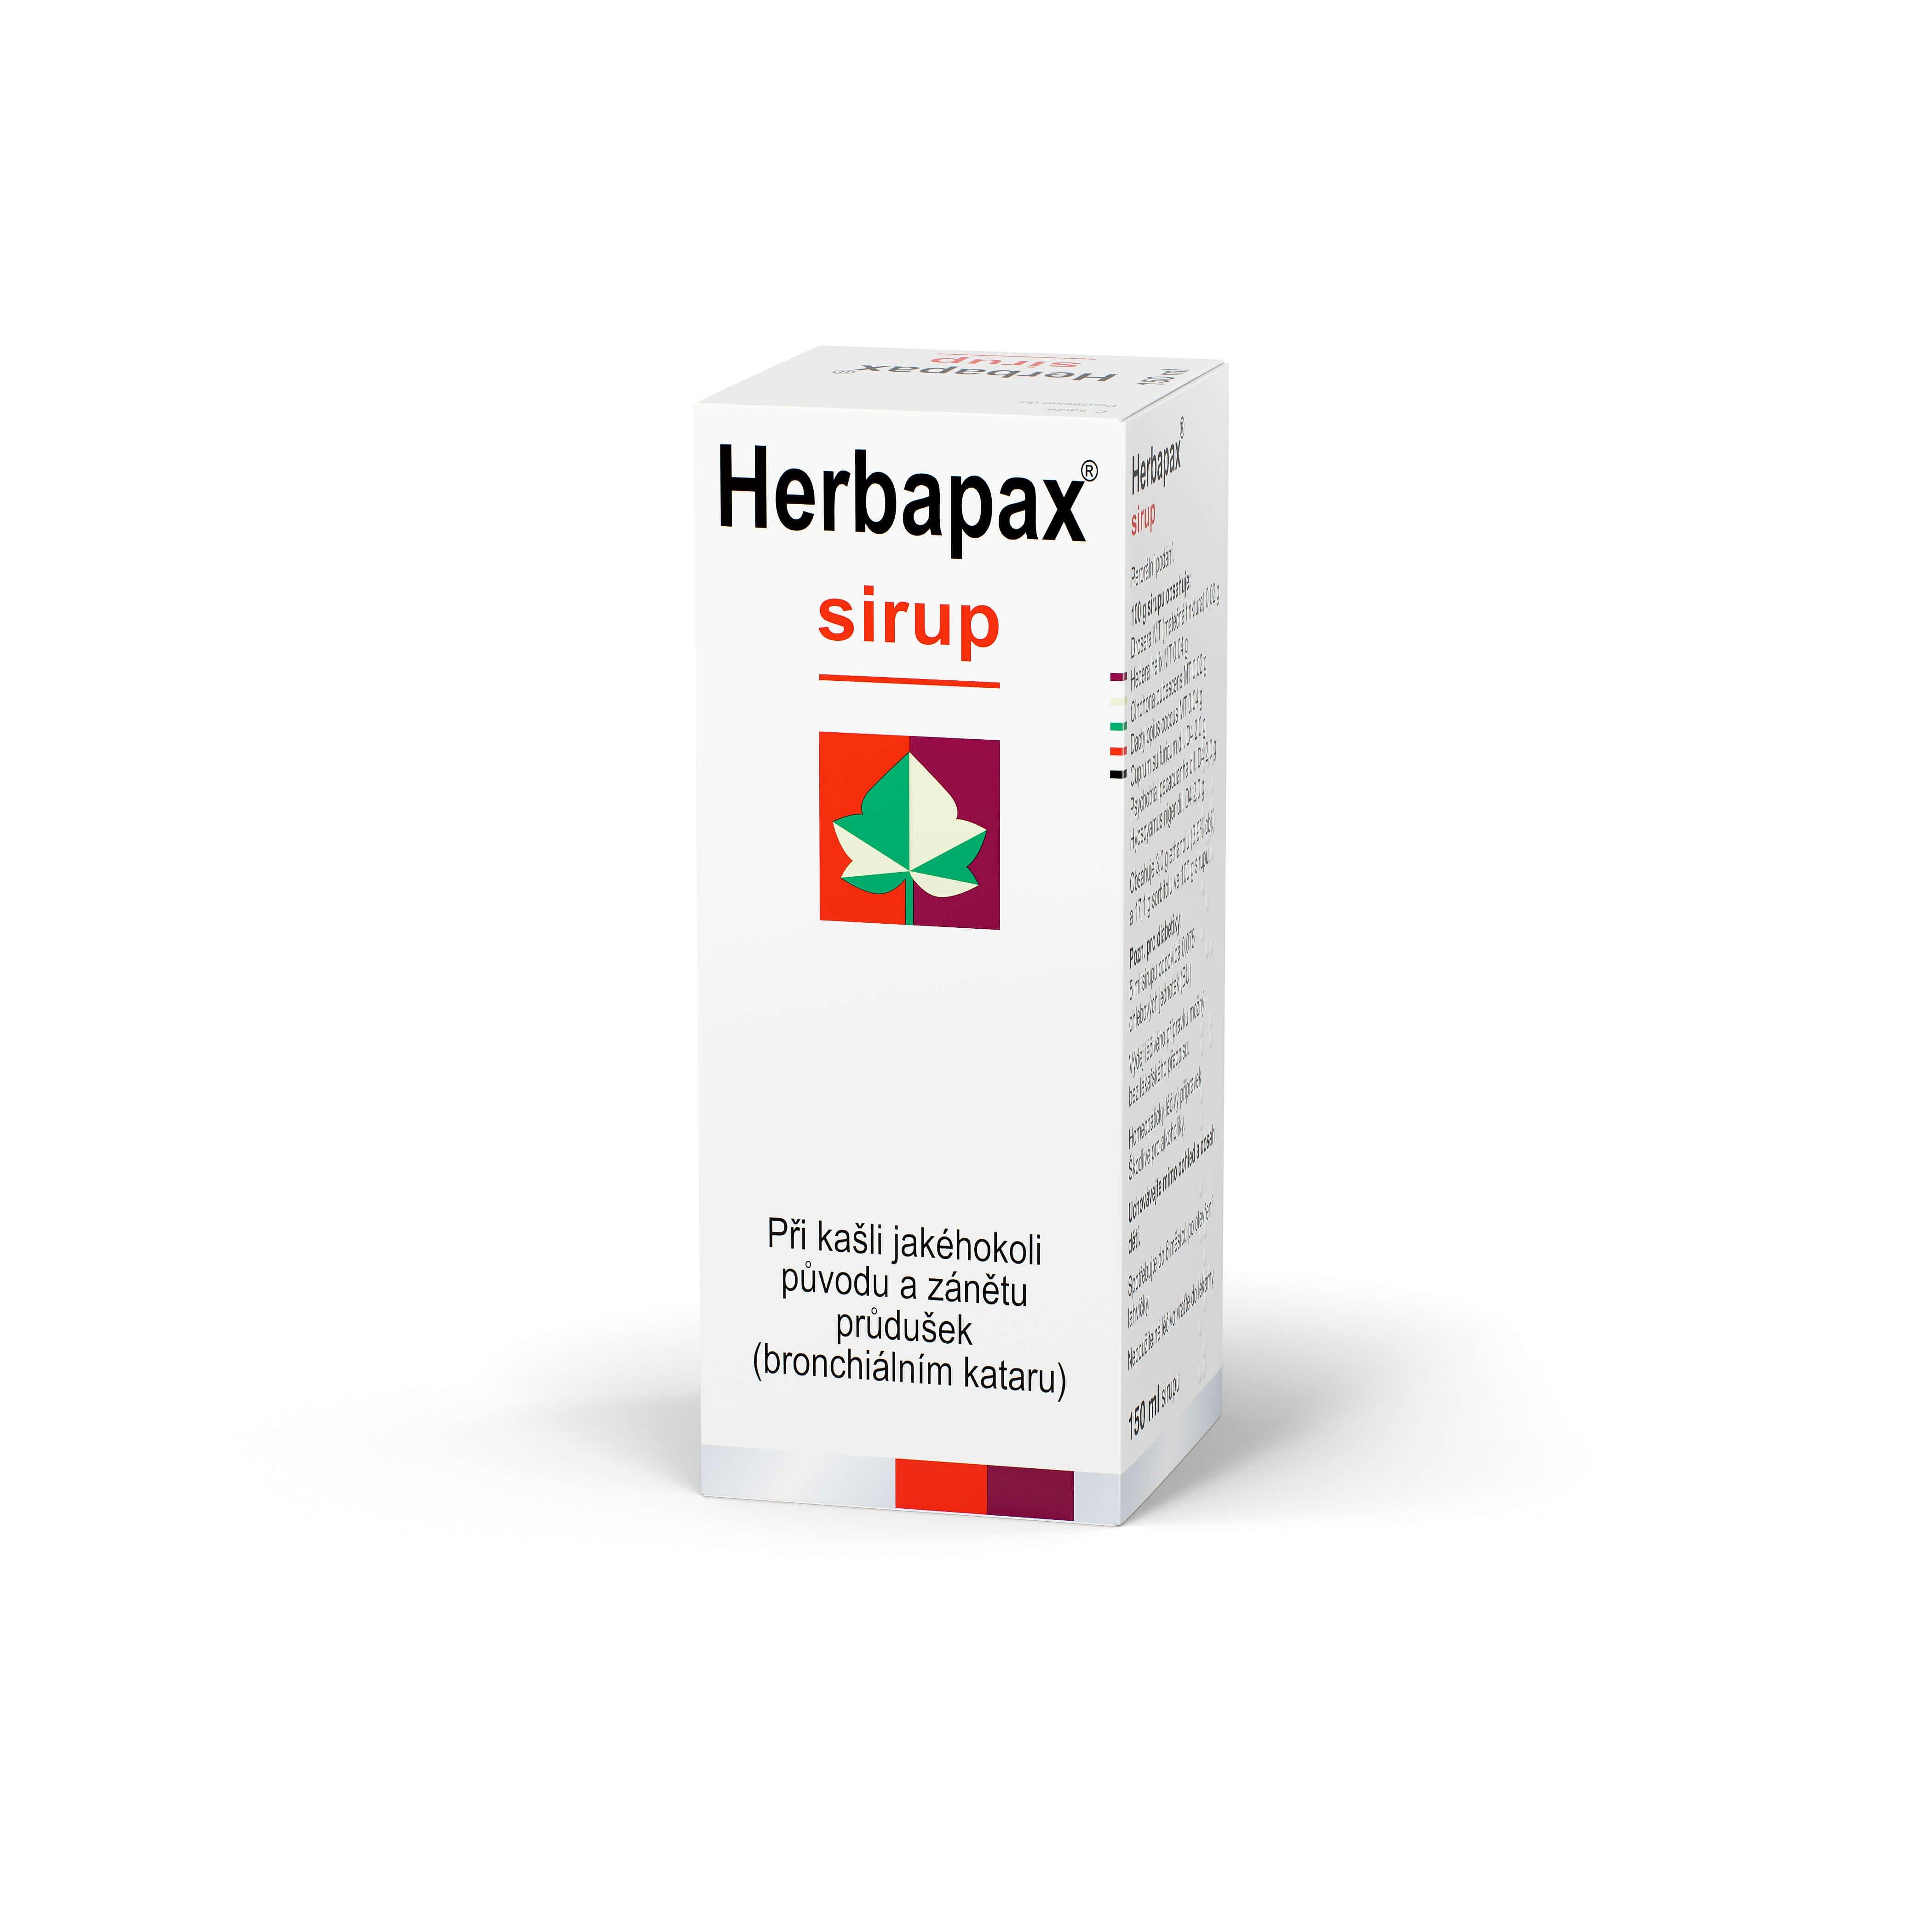 Herbapax sirup 150ml